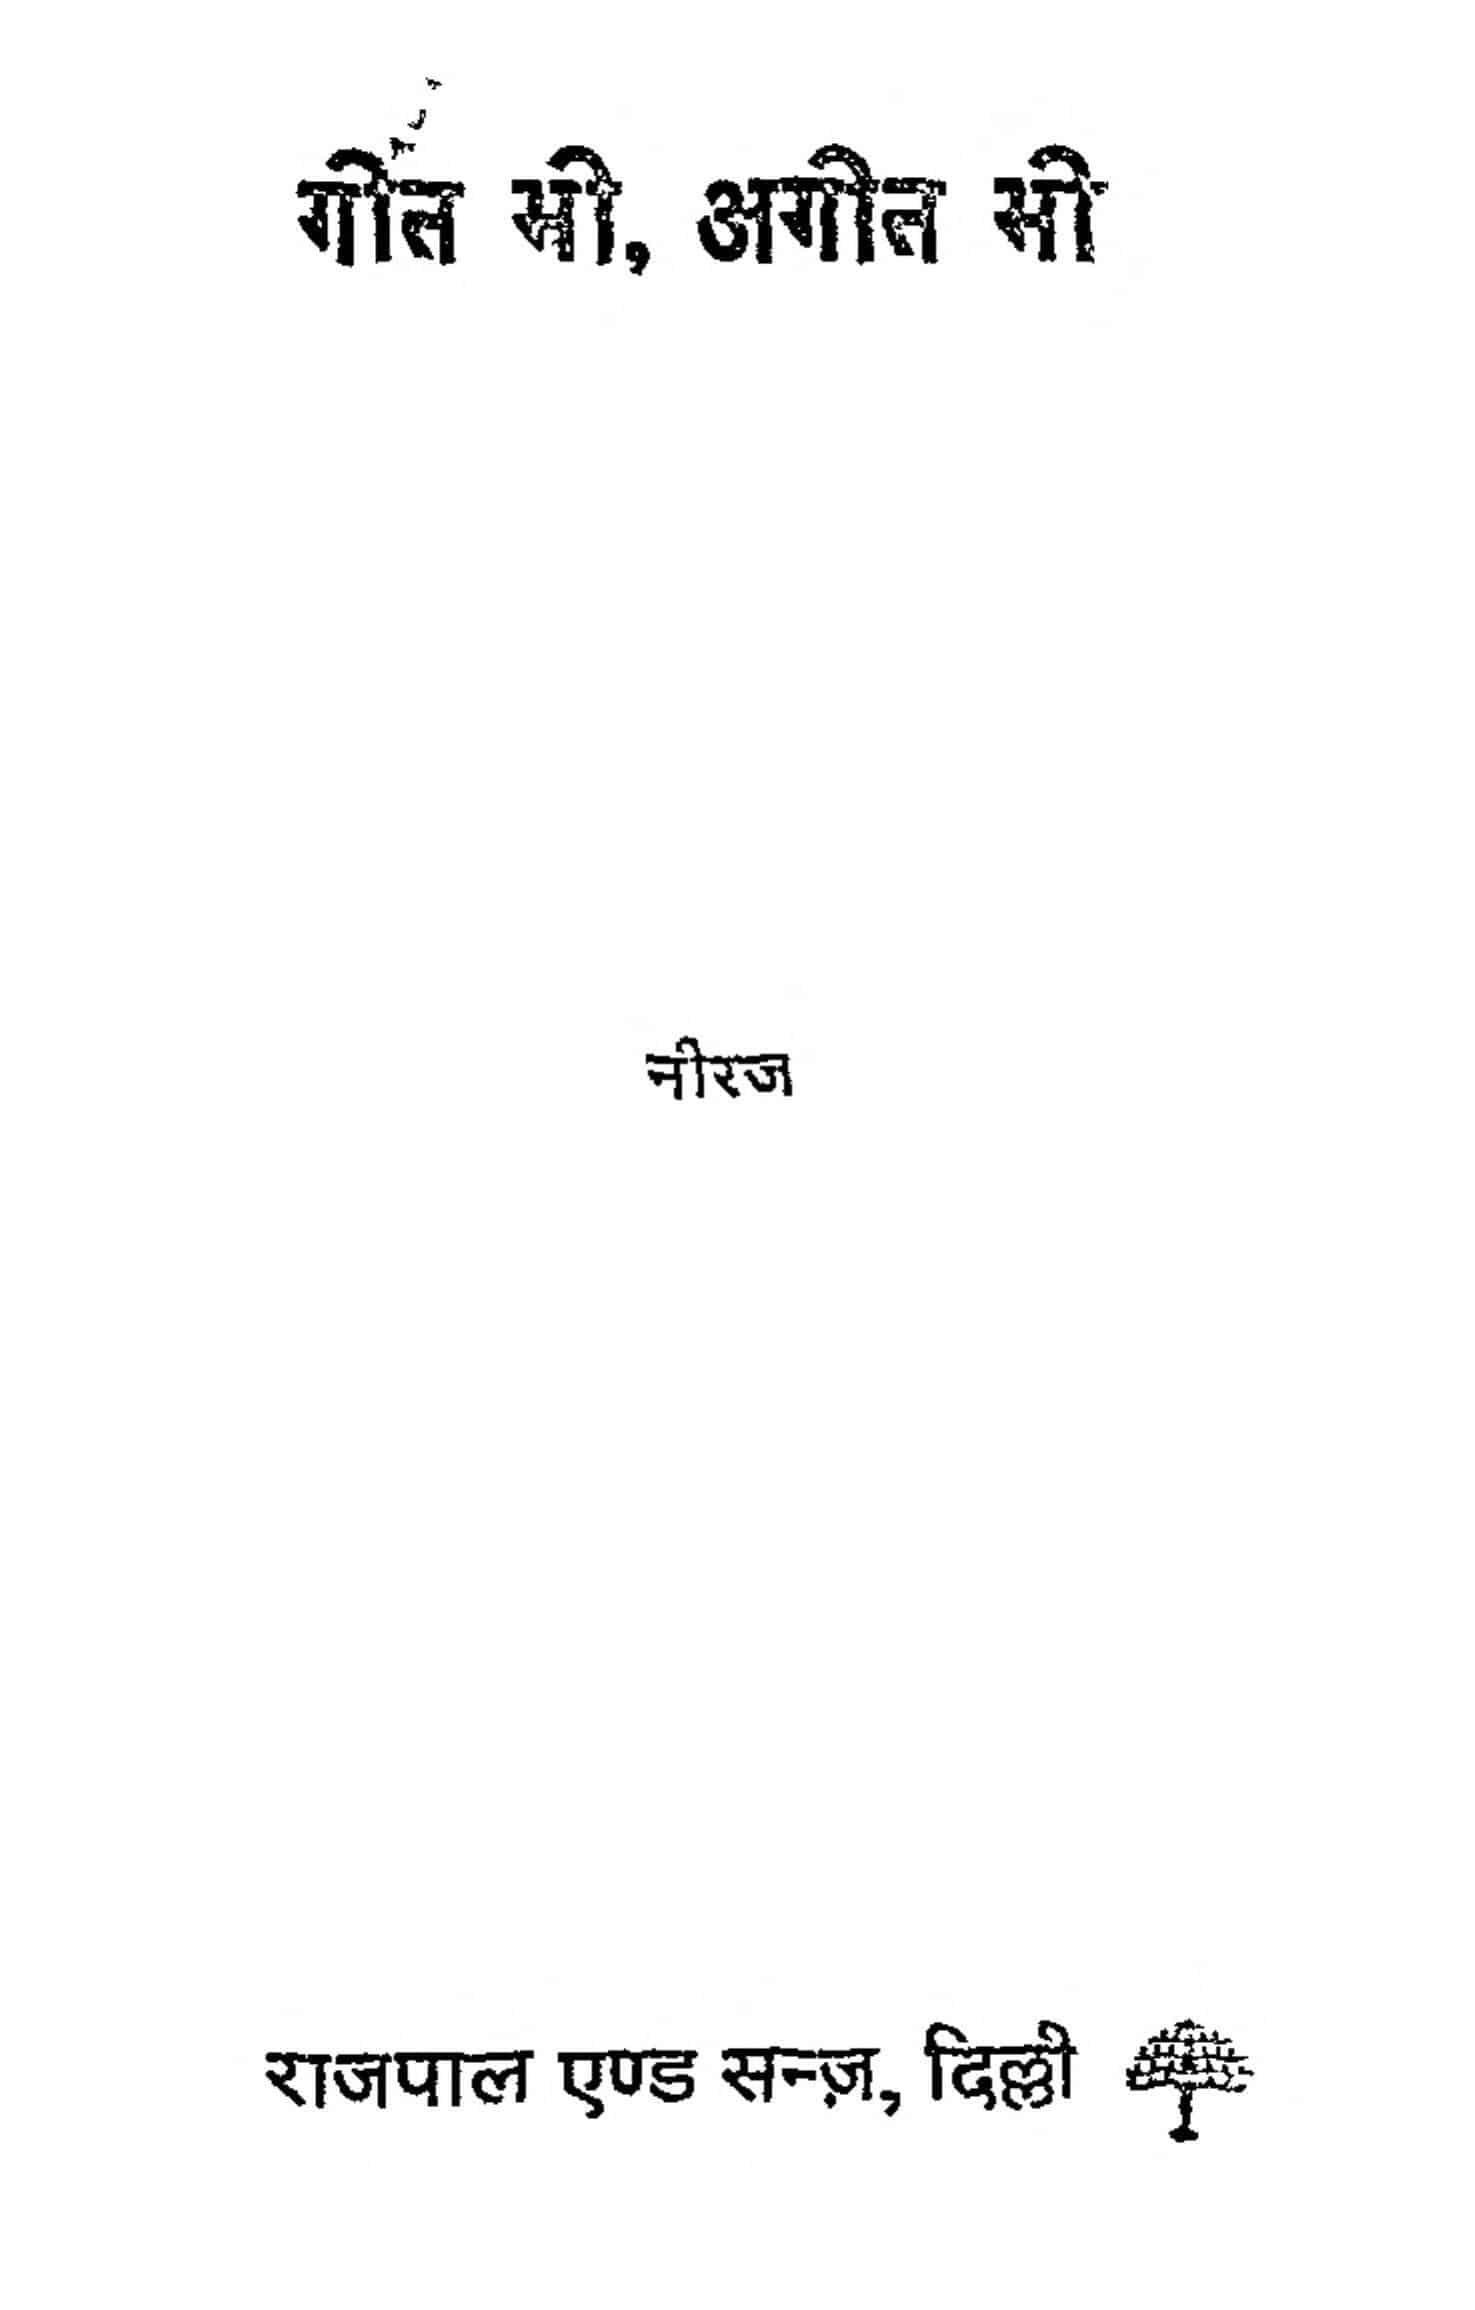 Book Image : गीत भी अगीत भी - Geet Bhi Ageet Bhi